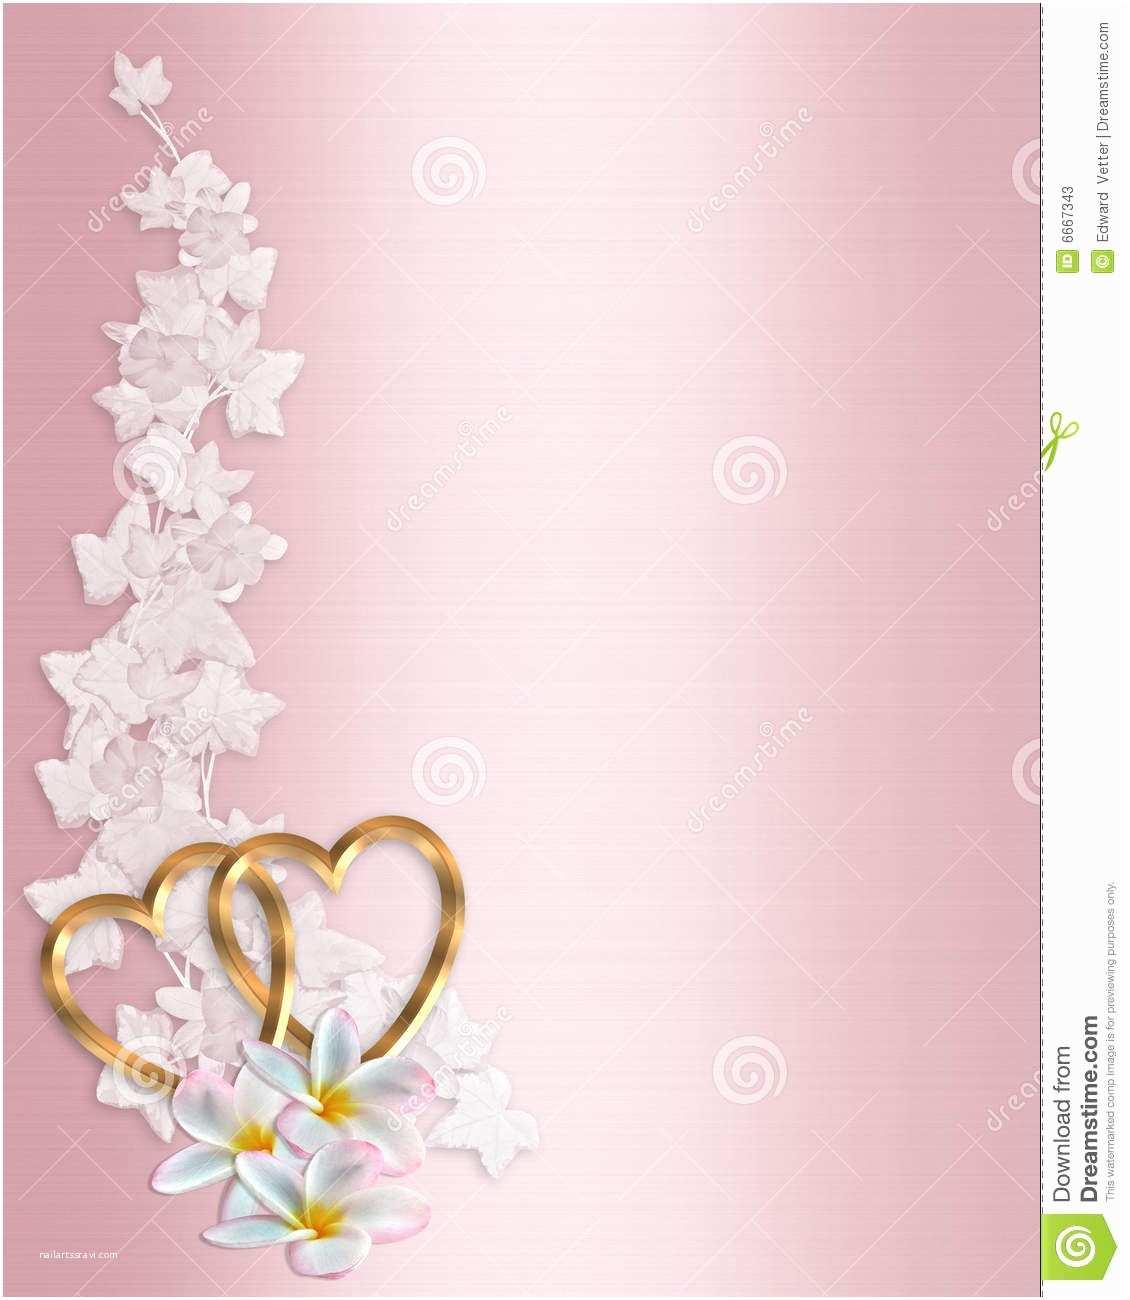 Background Designs for Wedding Invitations Free Wedding Invitation Pink Plumeria Stock Illustration